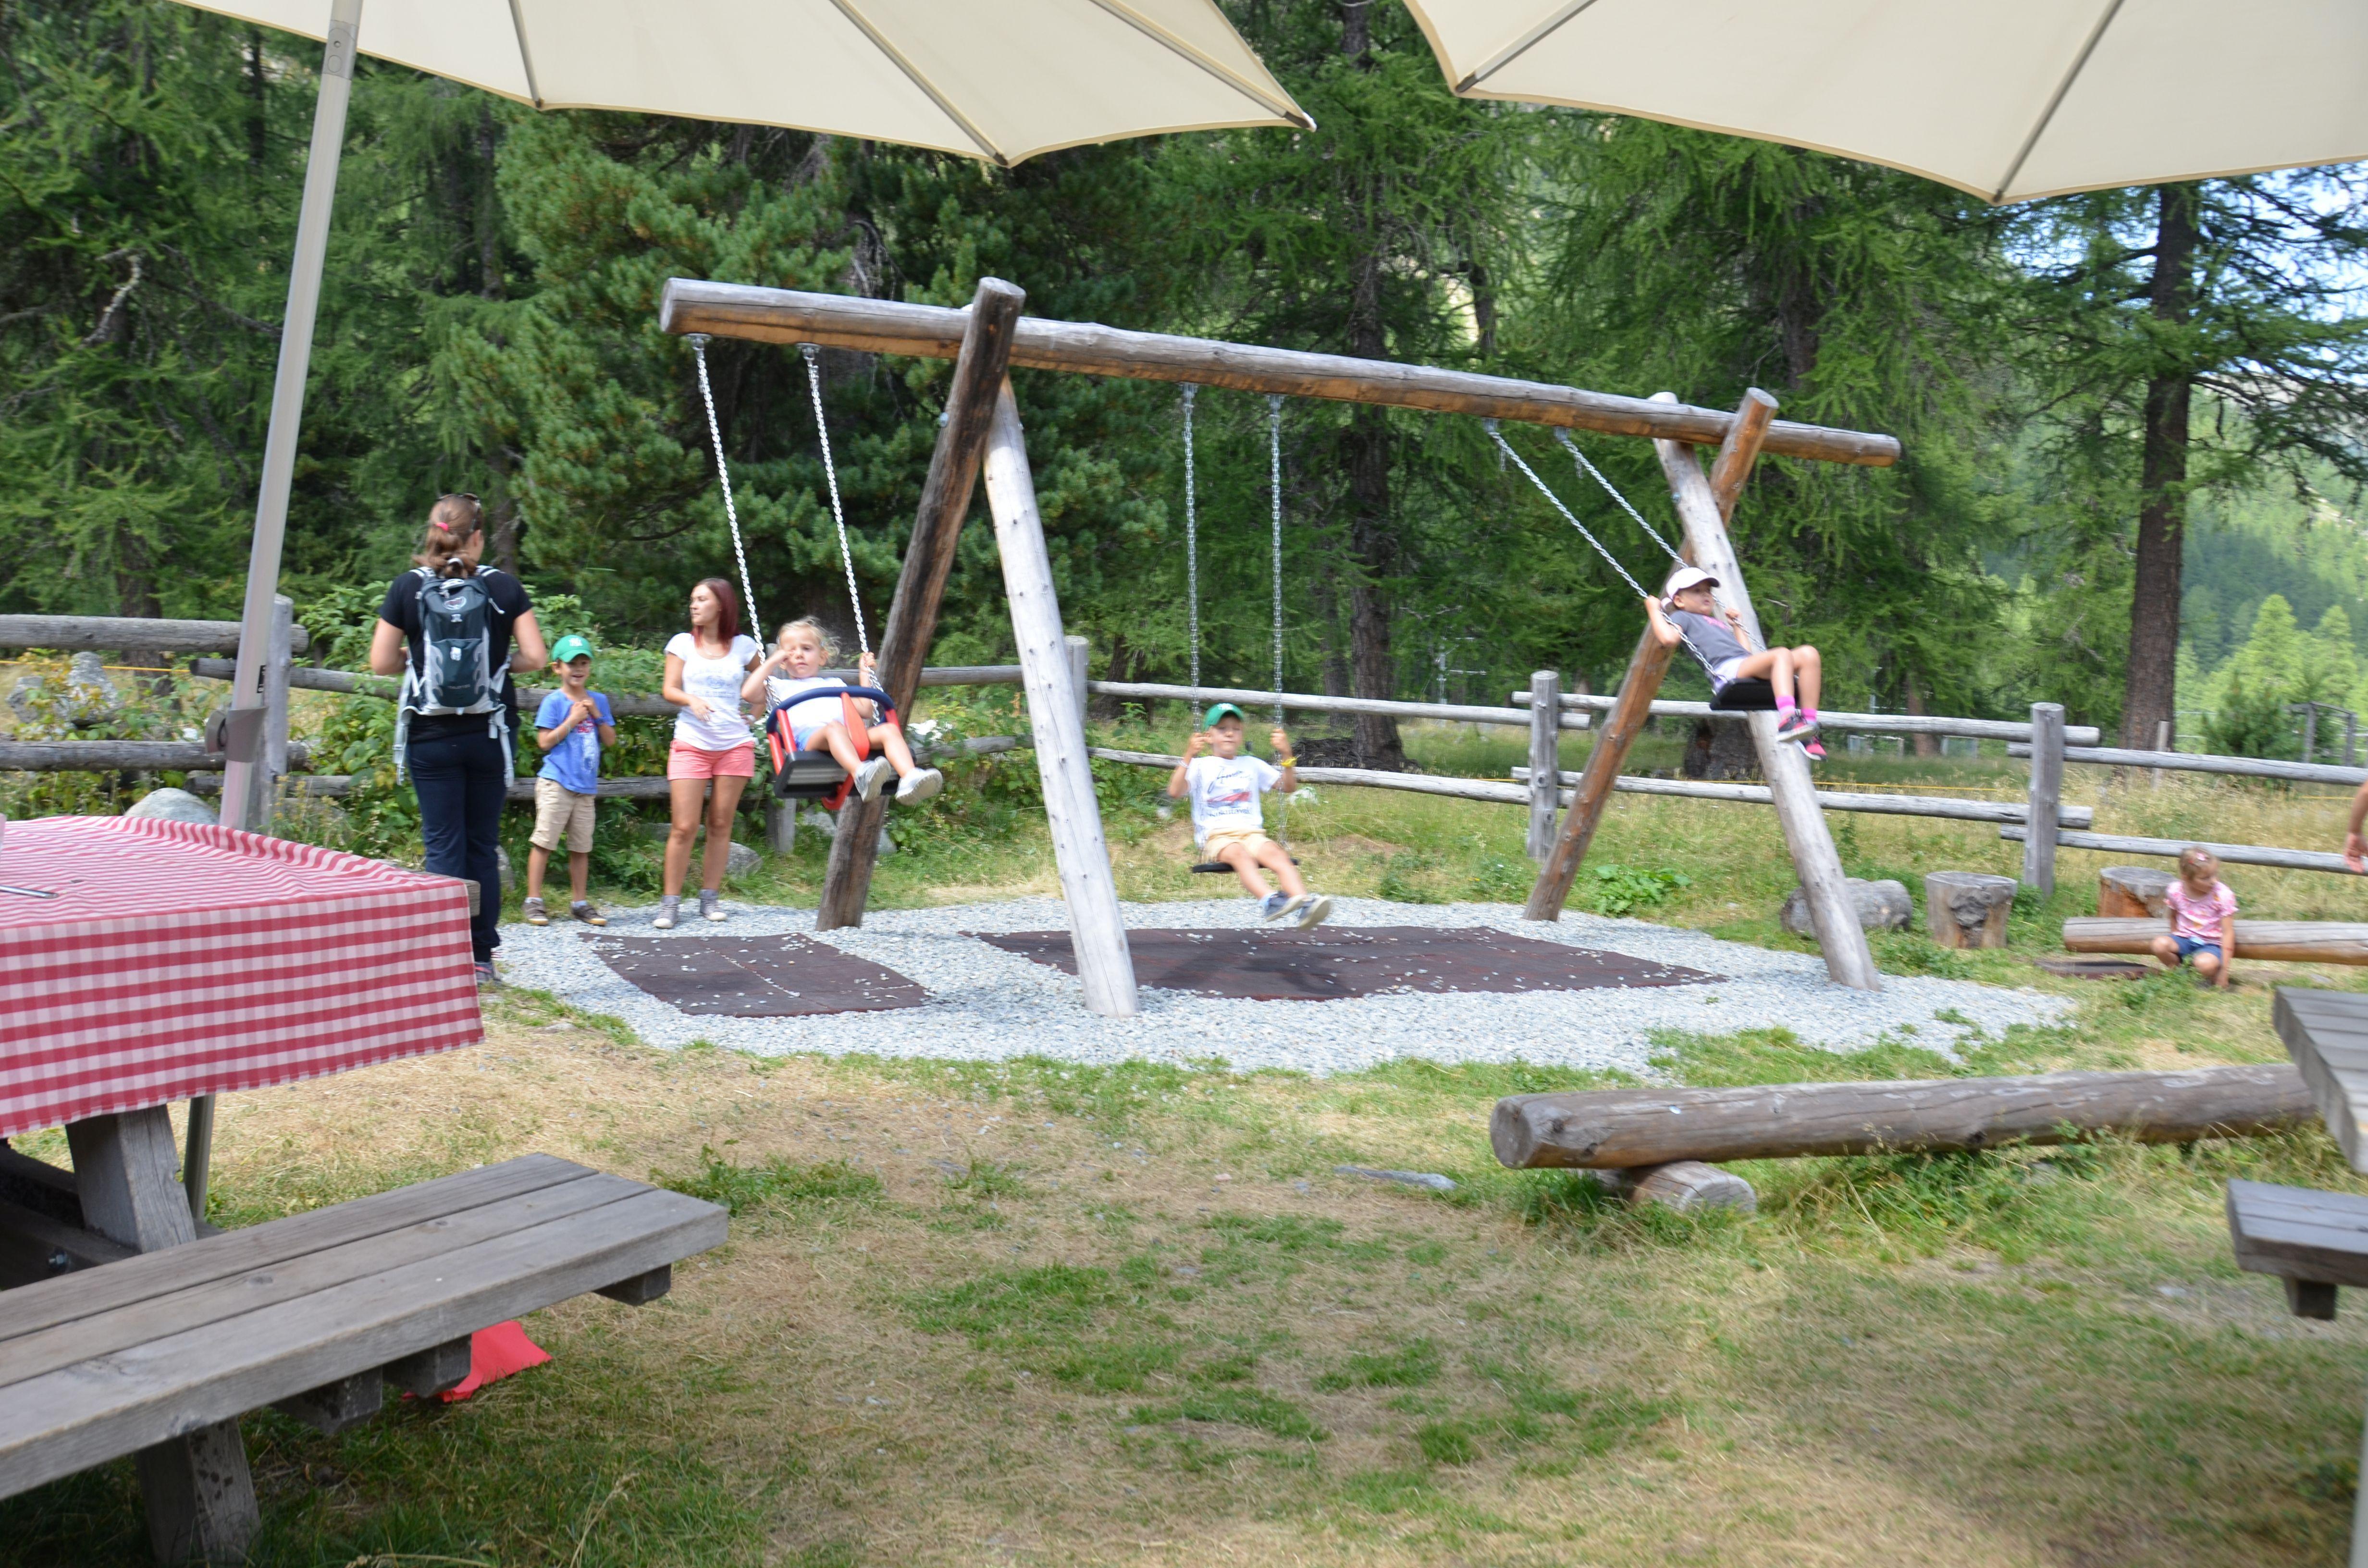 Kinderspielplatz Alp Schaukäserei Slide 1